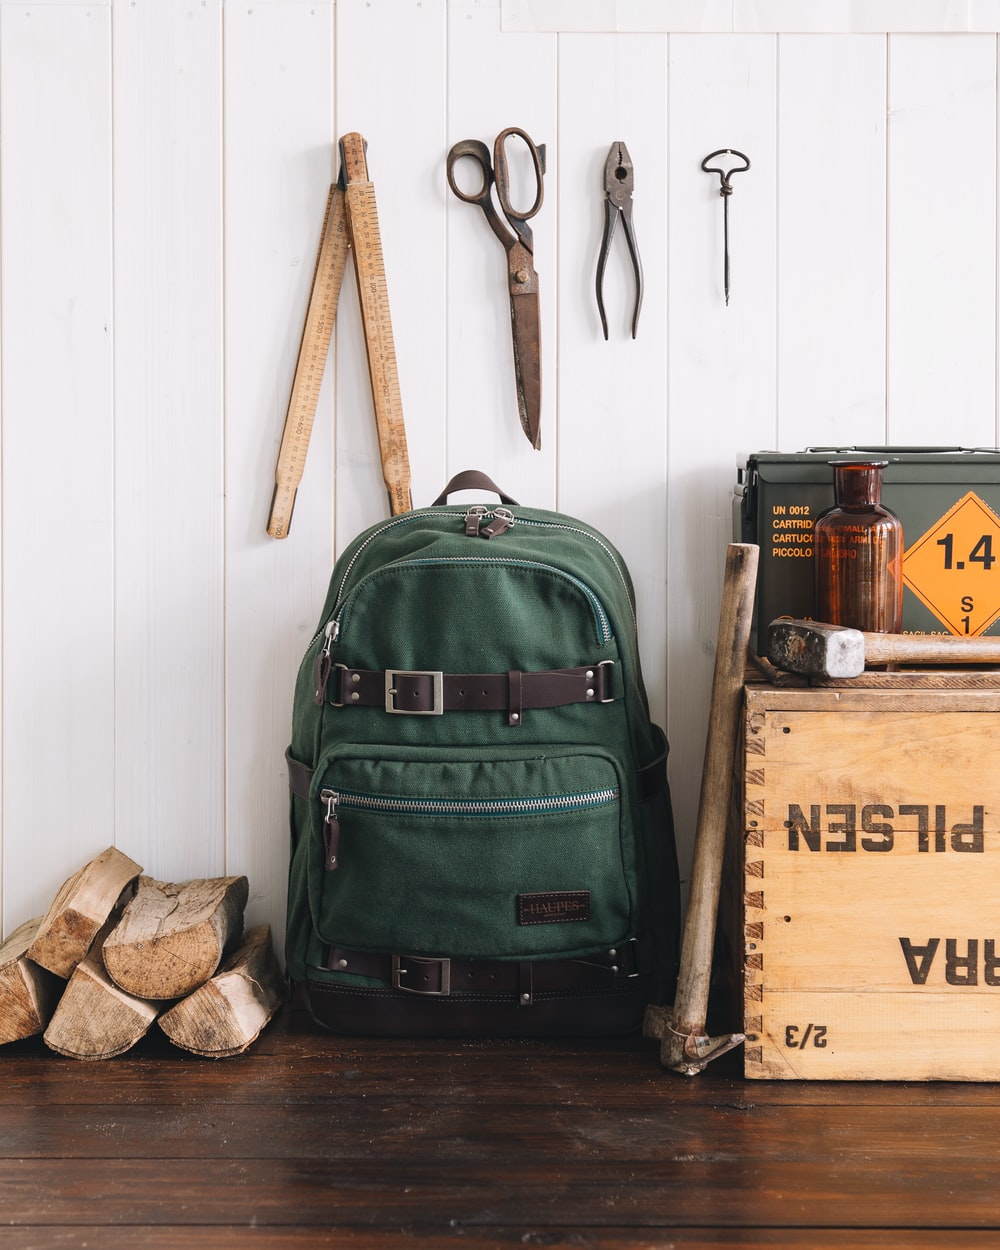 green backpack near wall